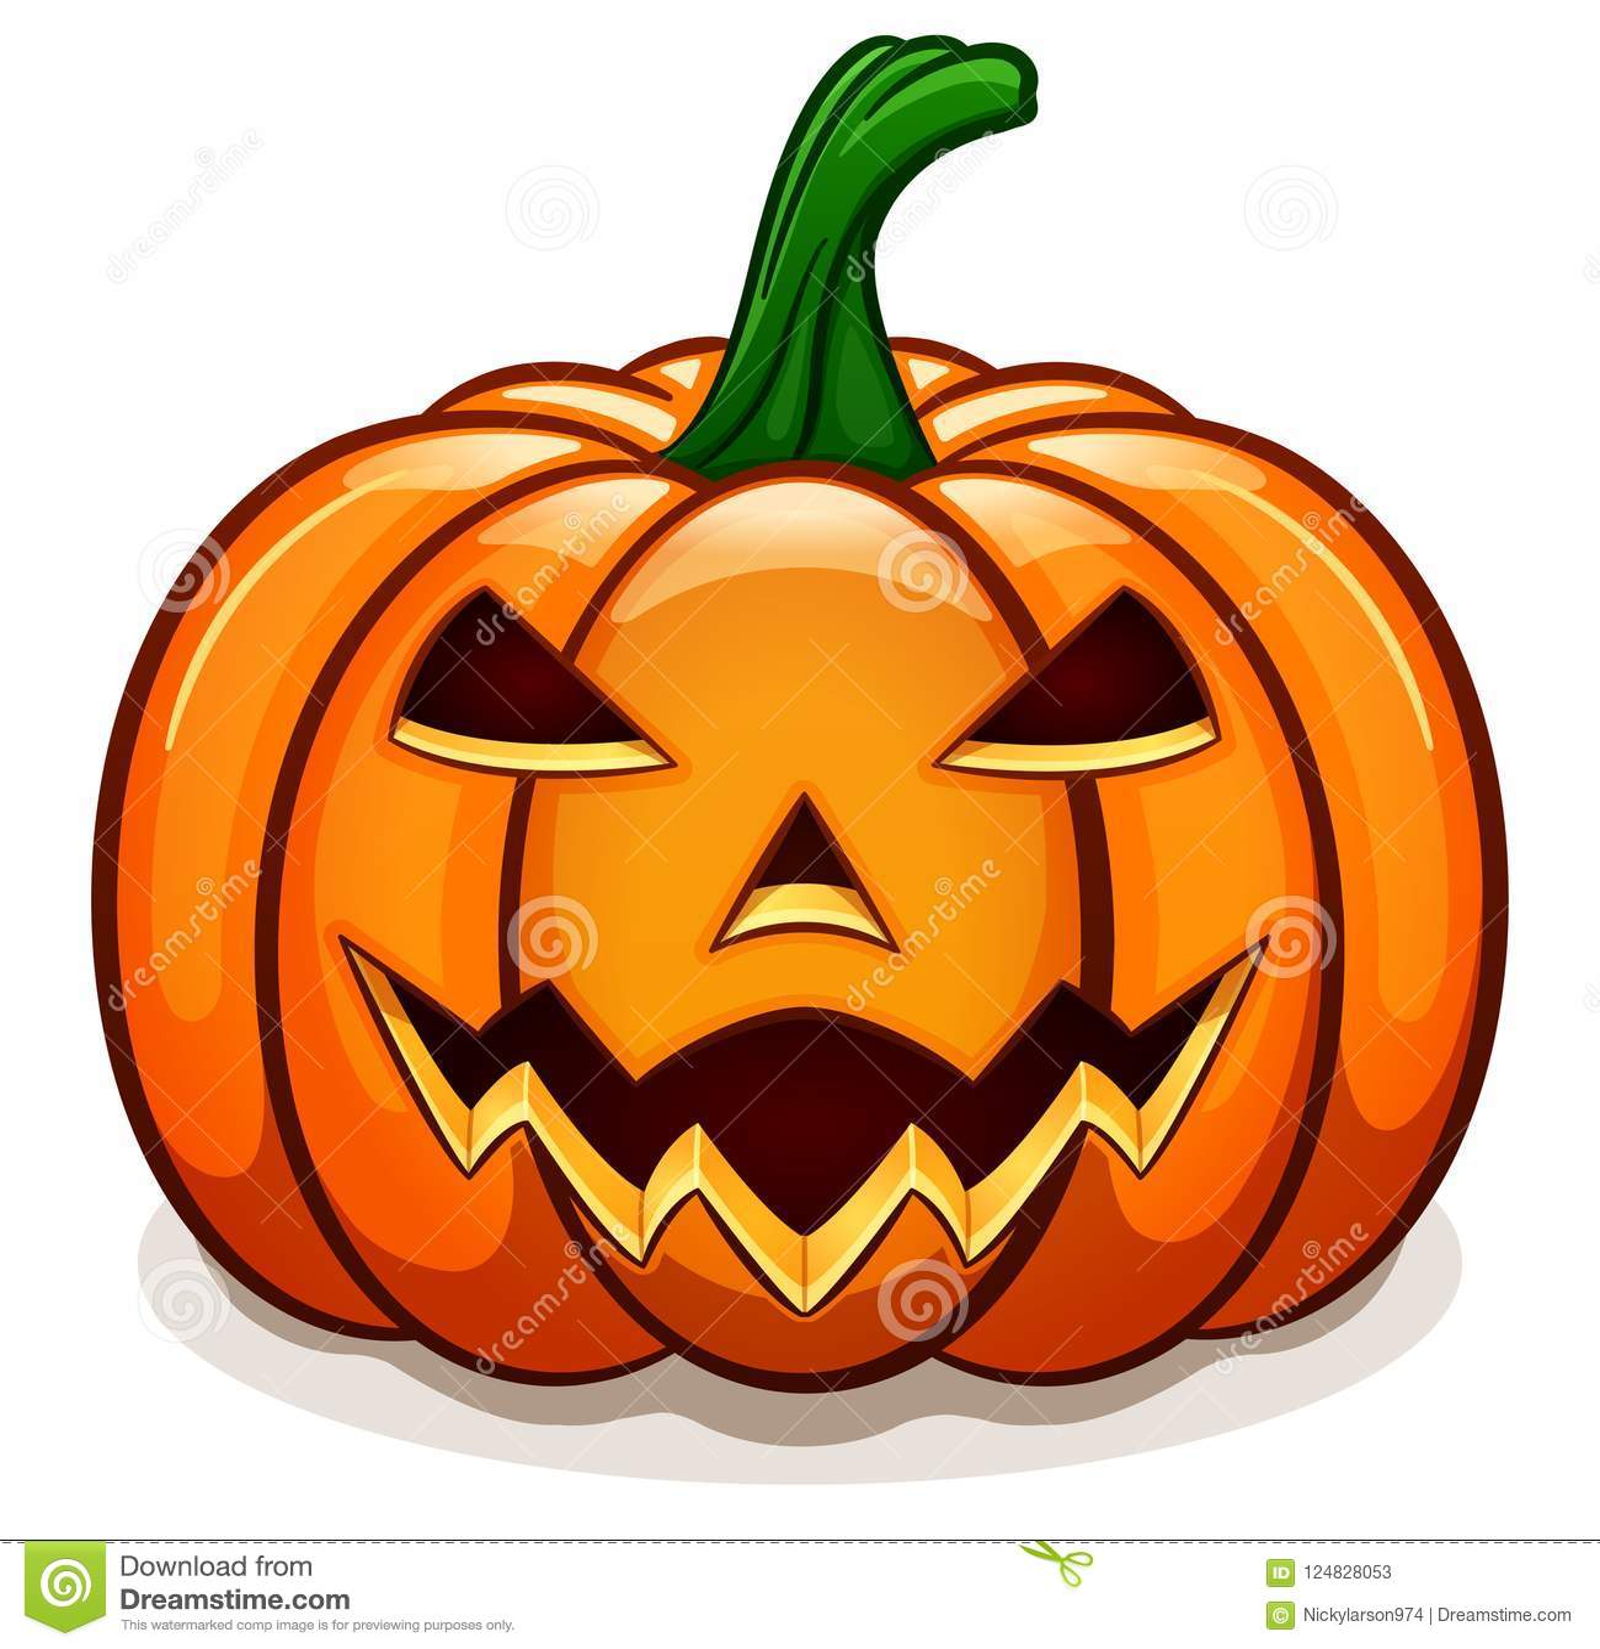 vector orange halloween pumpkin design stock vector - illustration